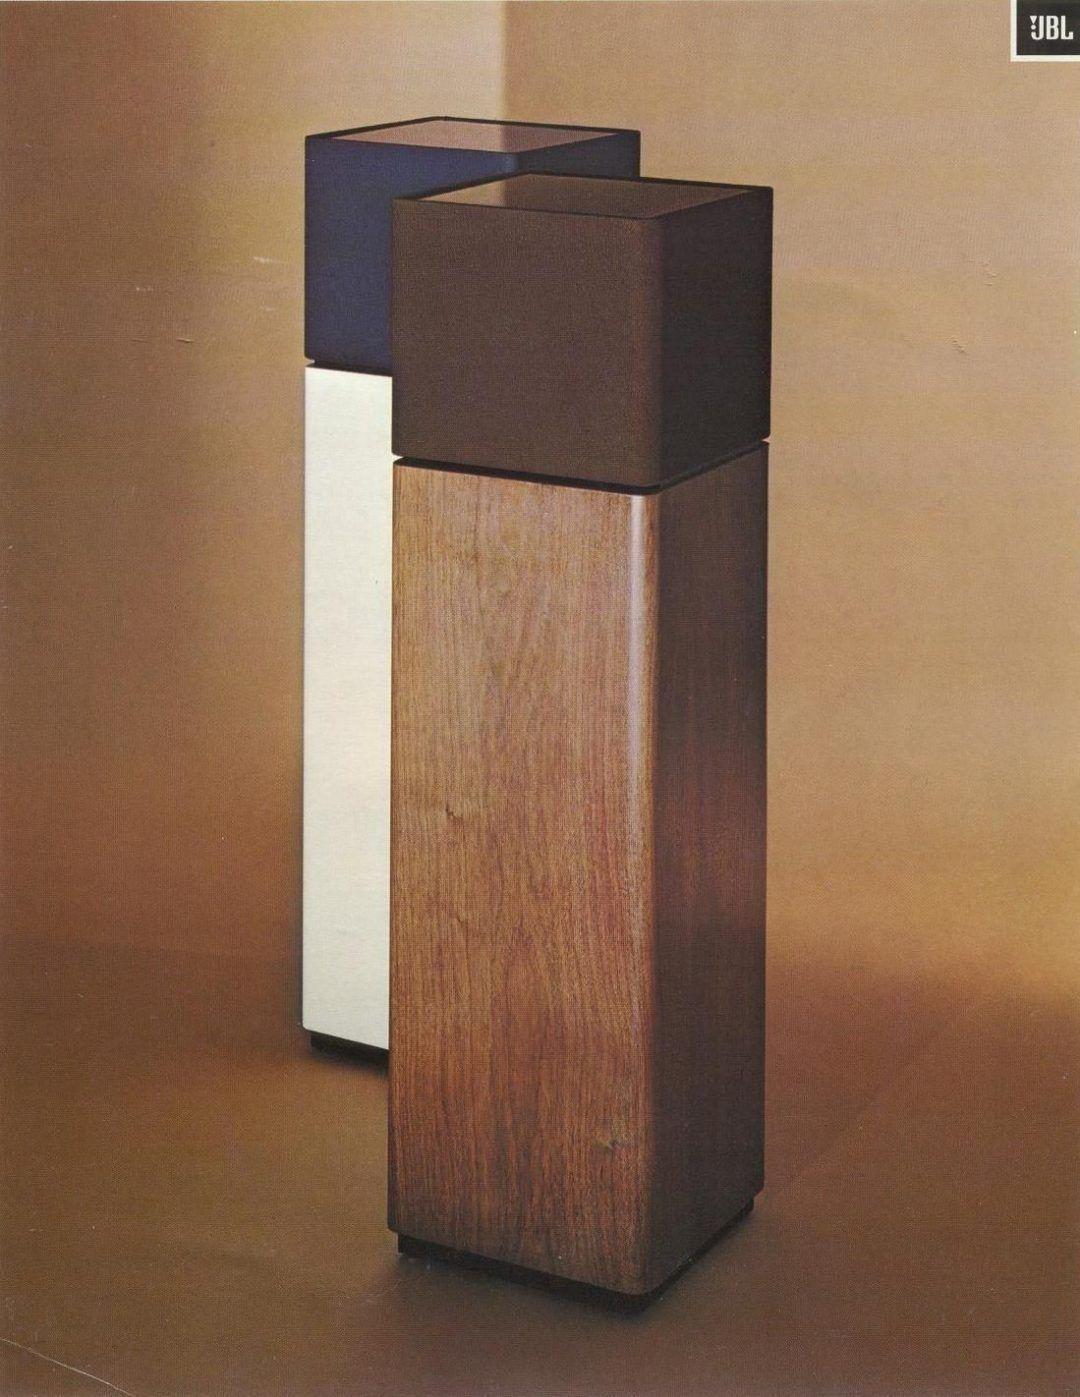 11 Diy Speaker Stand To Get A Perfect Sound Experience - 0F0235C7E3Ab9Dfa5B4Cb6400Ba400F1